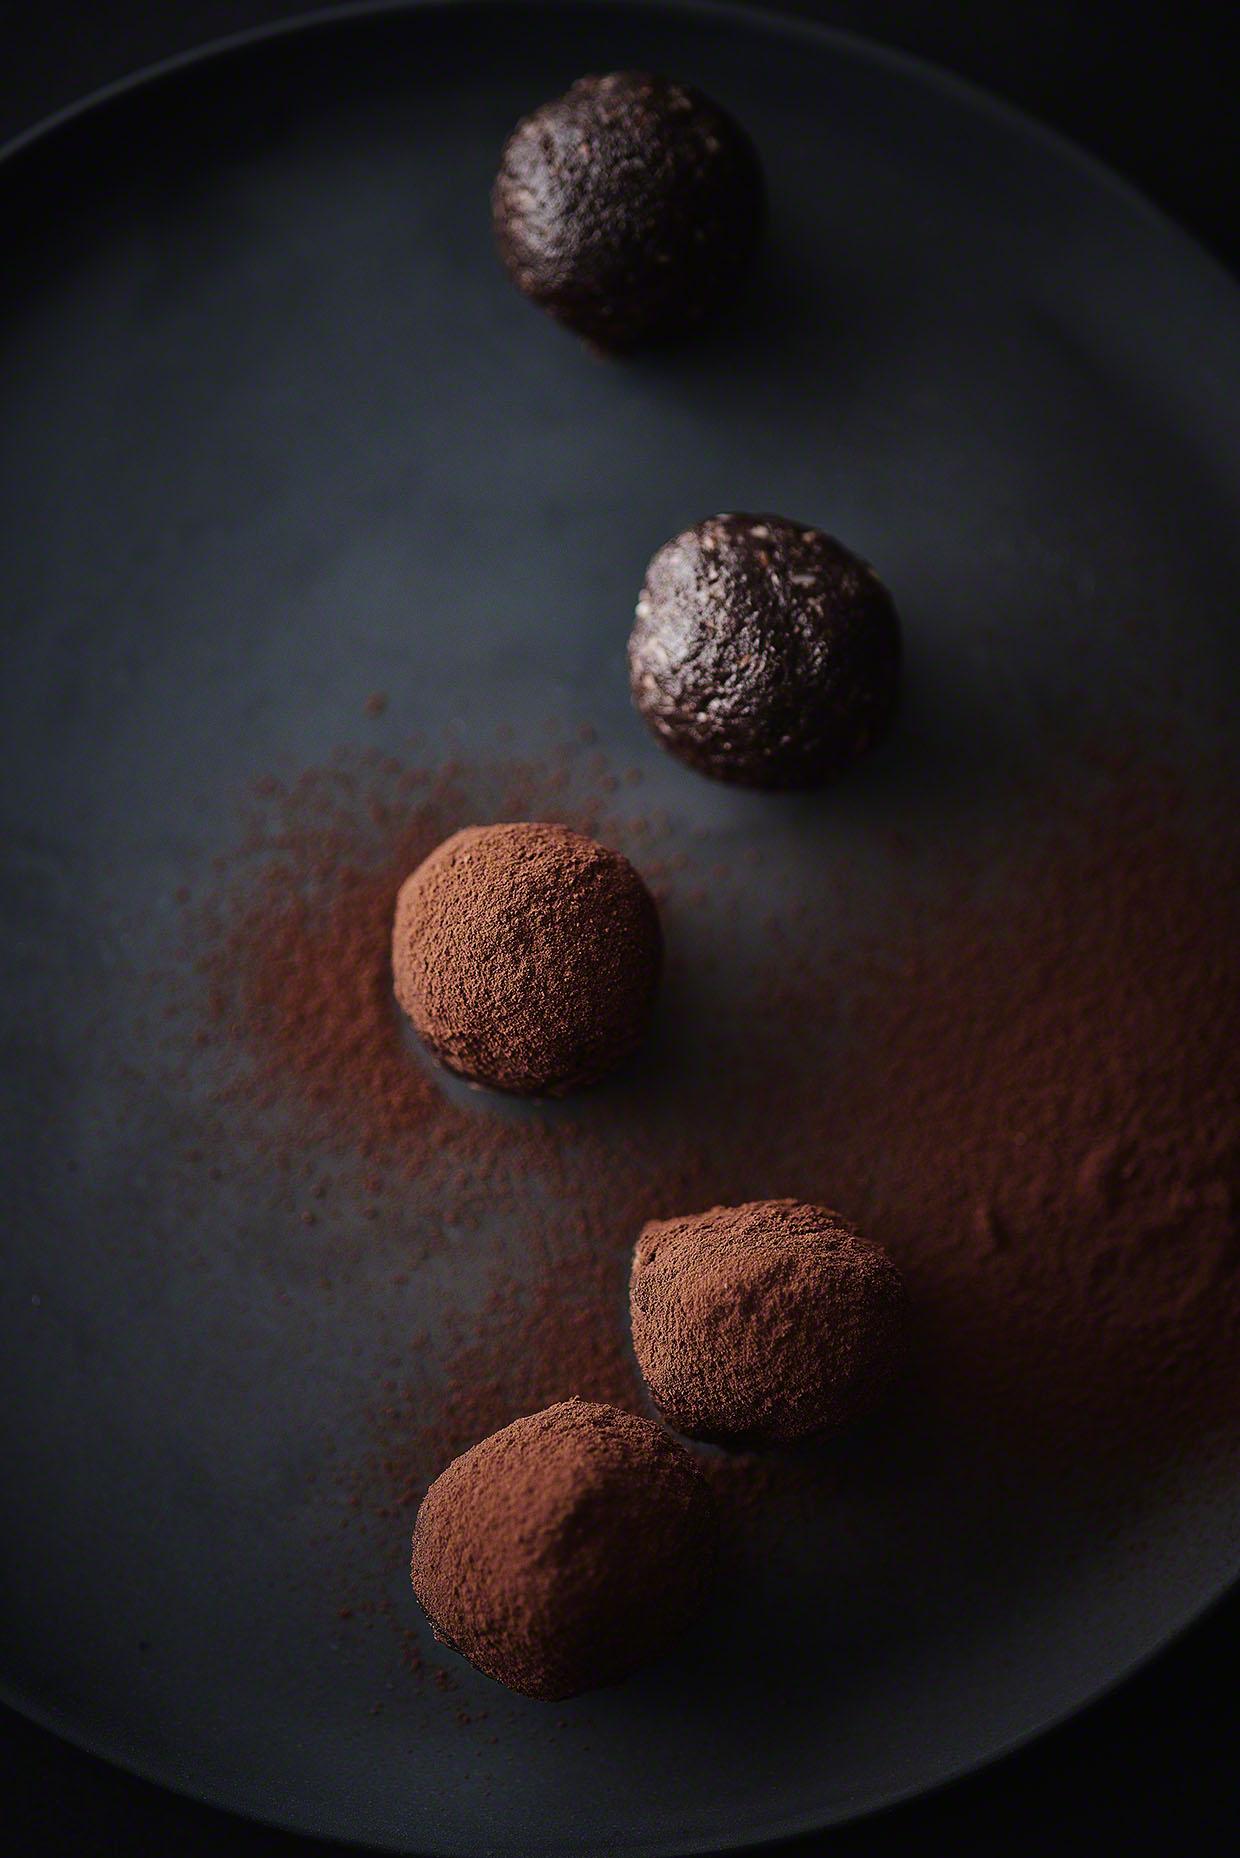 Gesunde Schoko-Mandel-Energiebällchen - Foodfotografie